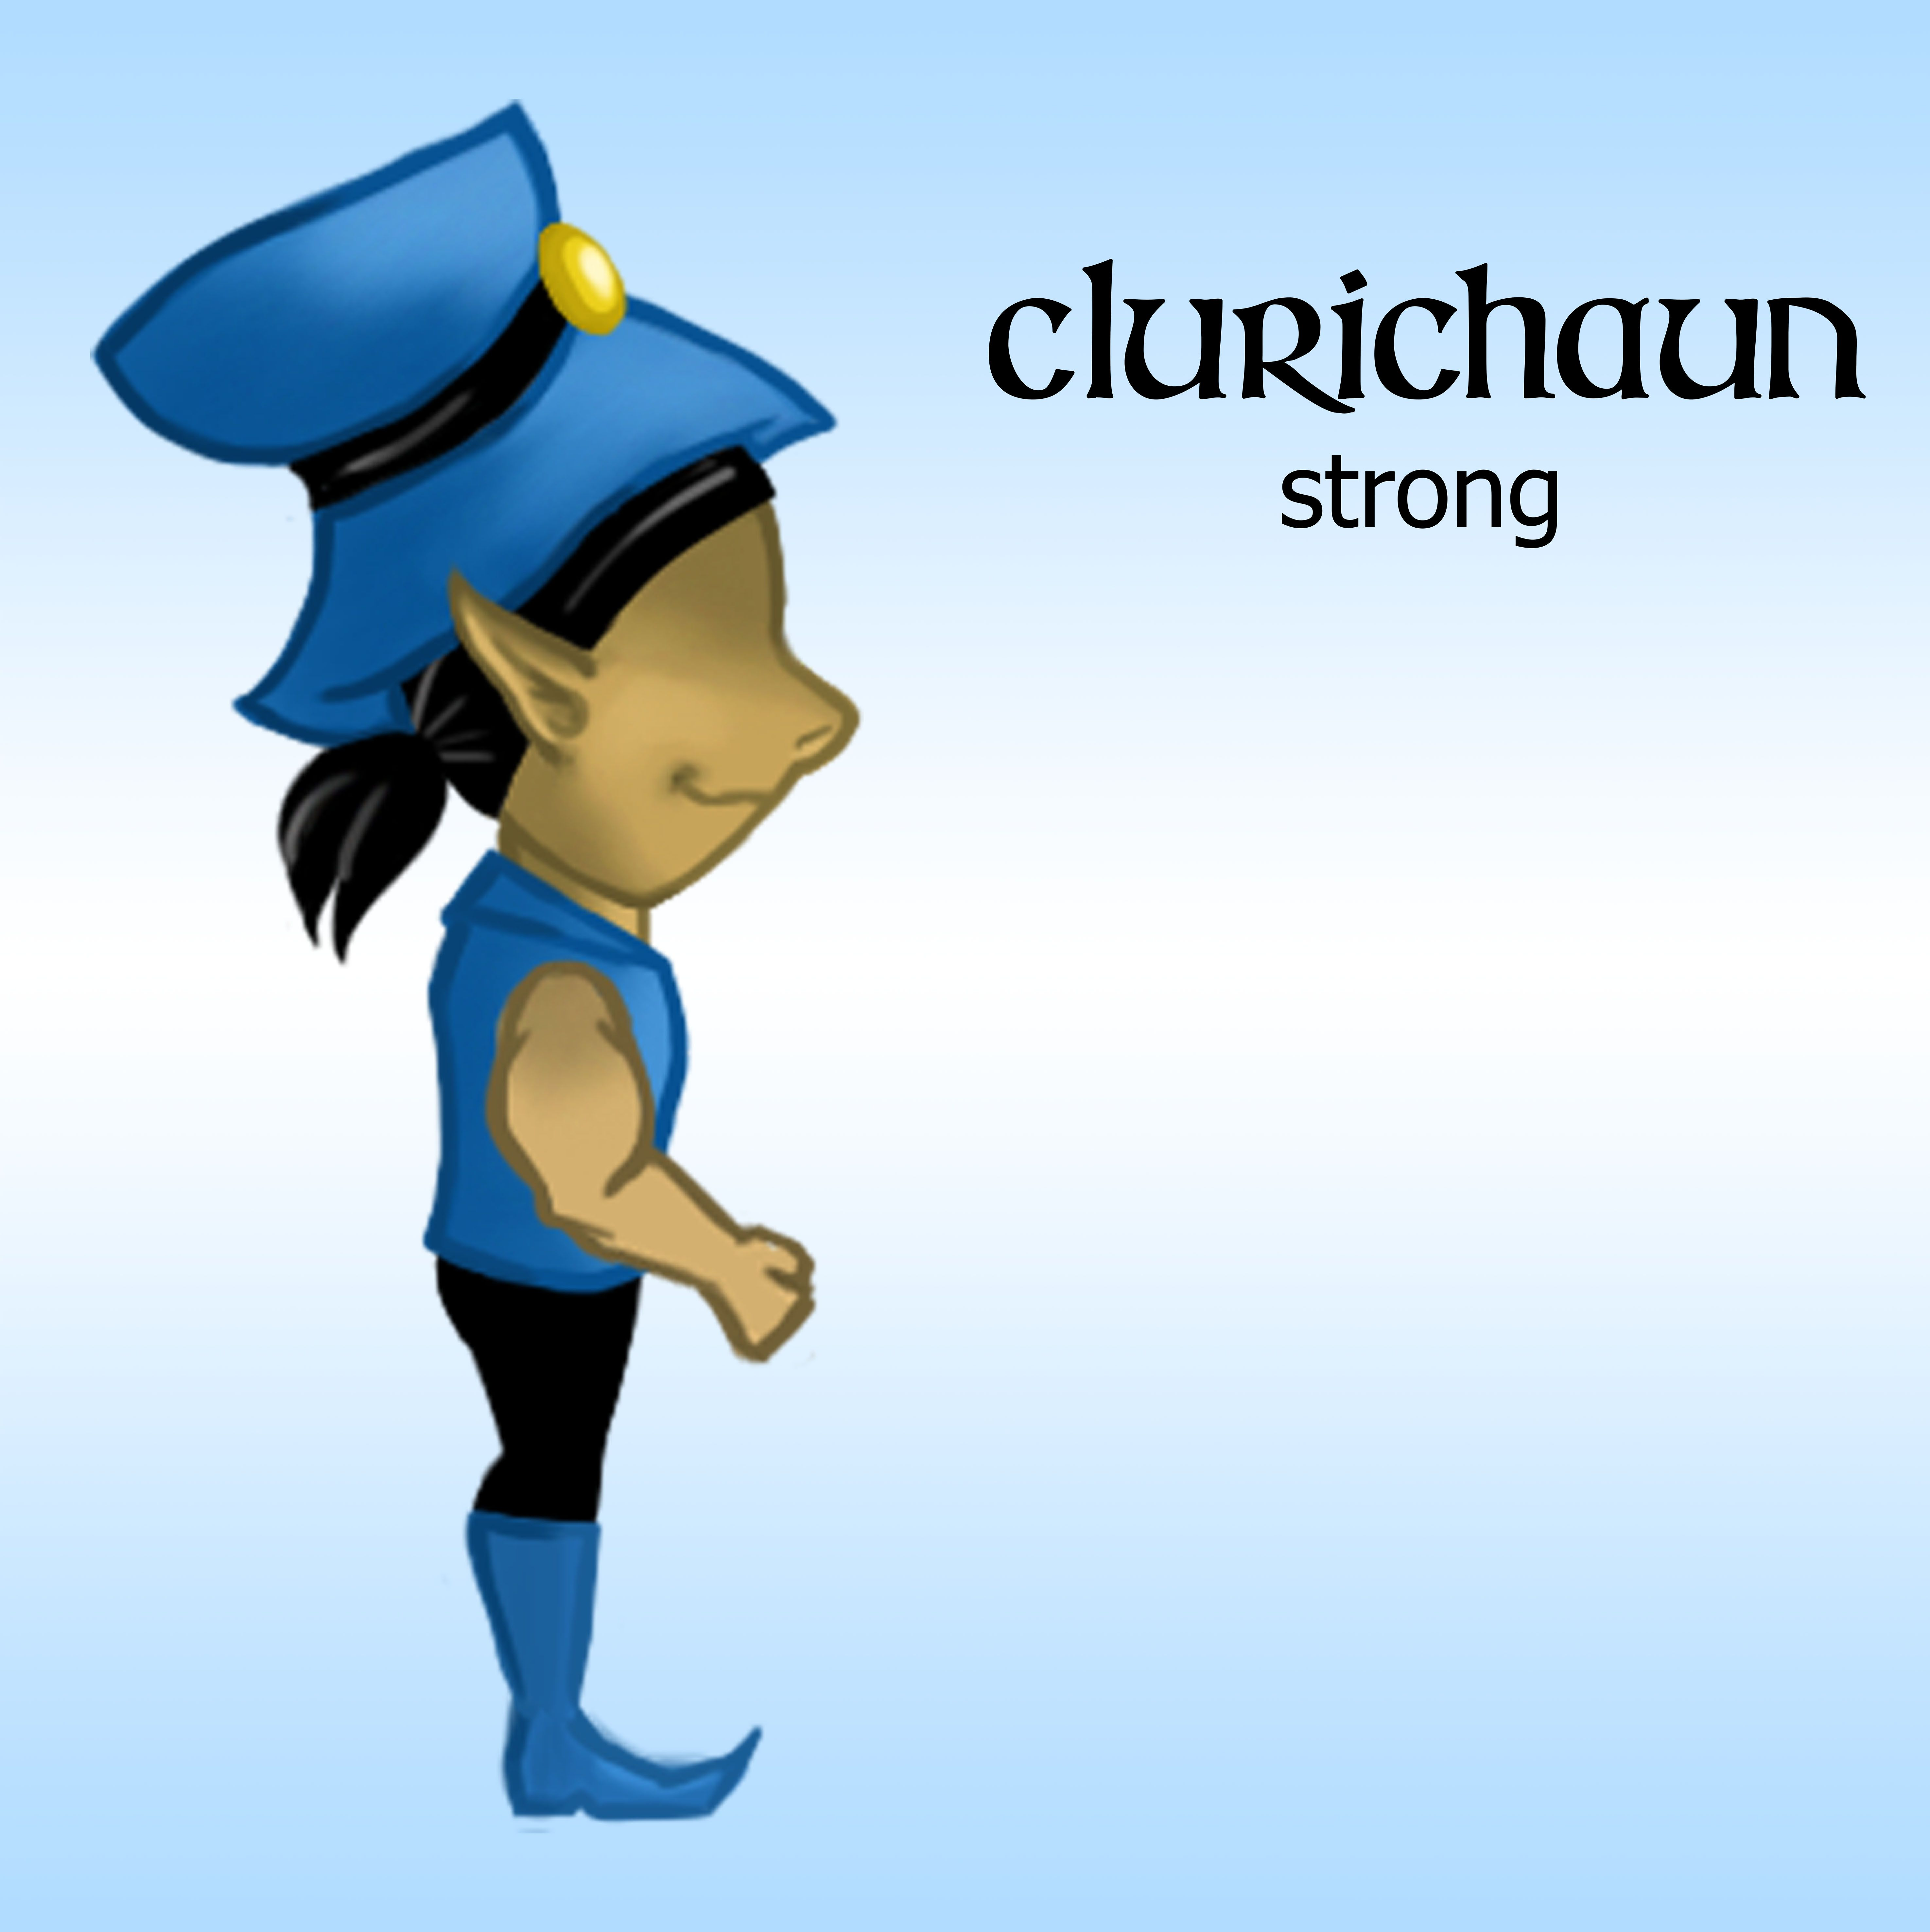 Clurichaun